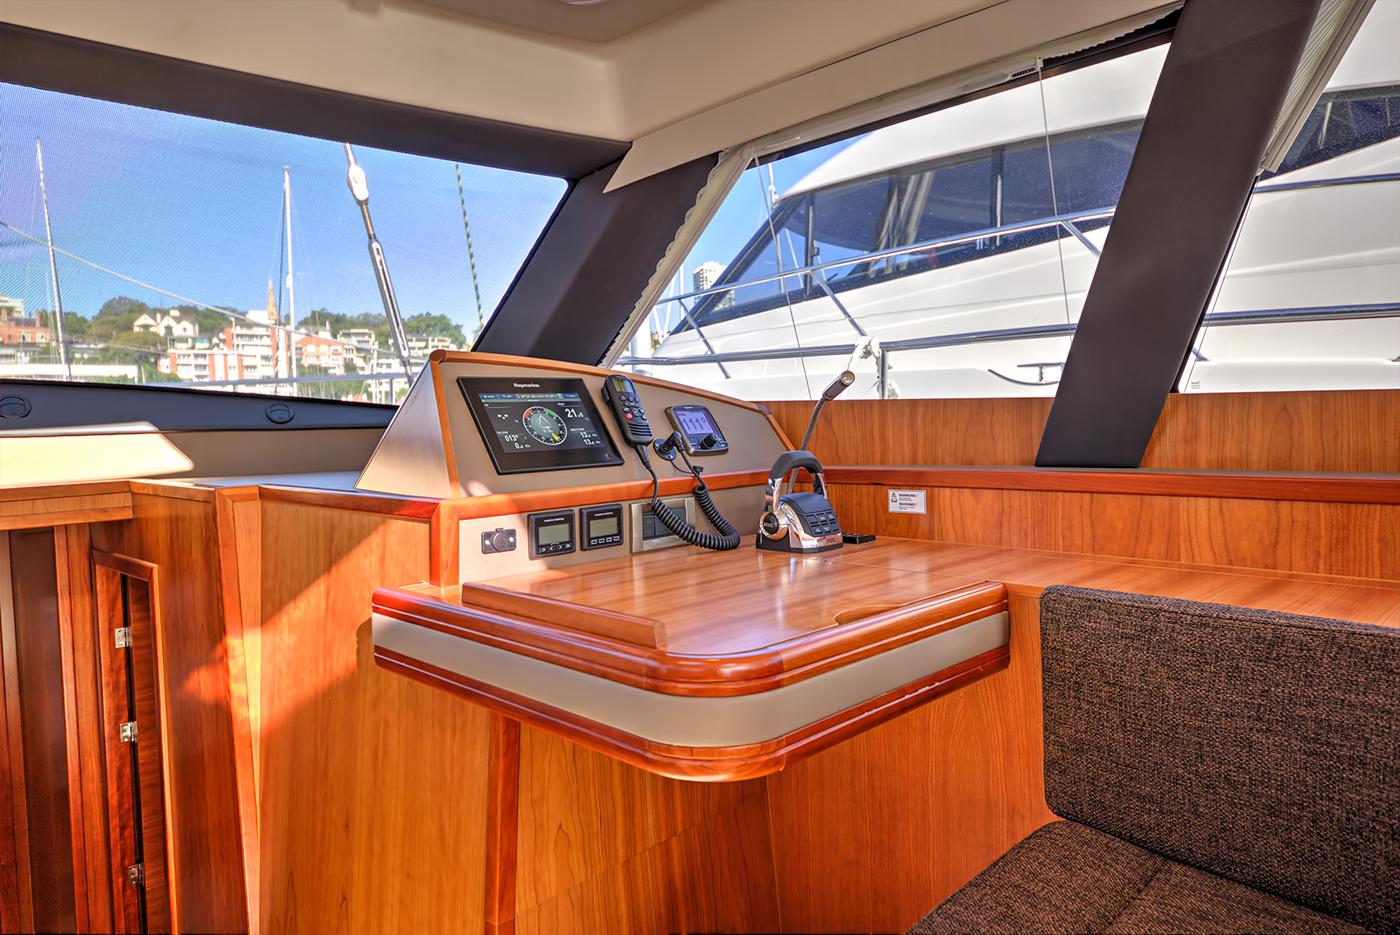 Boat Interiors On Behance